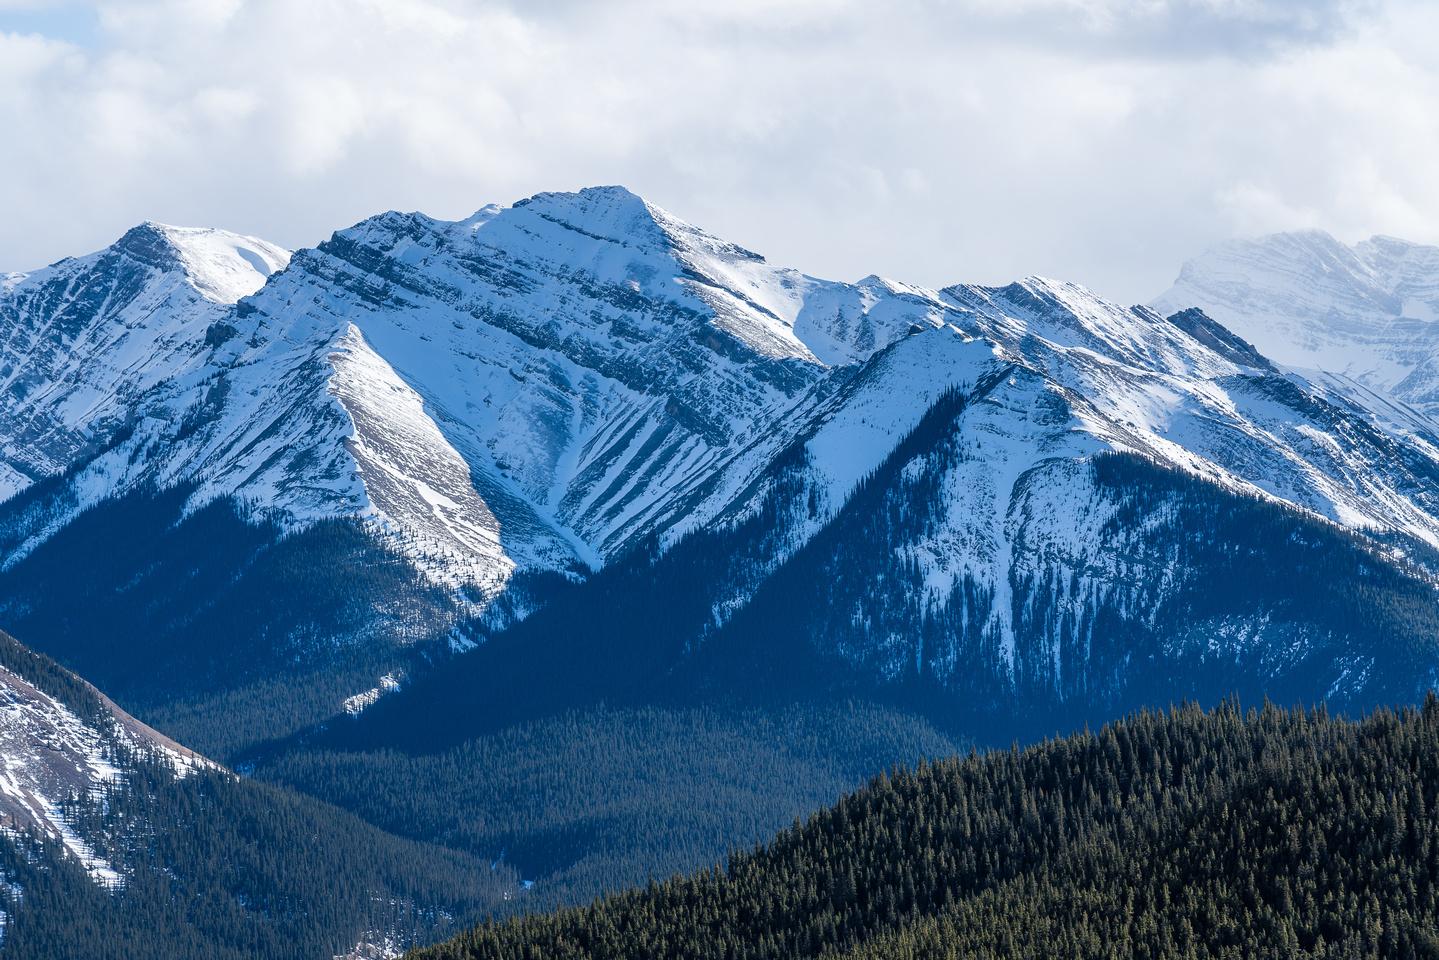 Part of Otuskwan Peak.